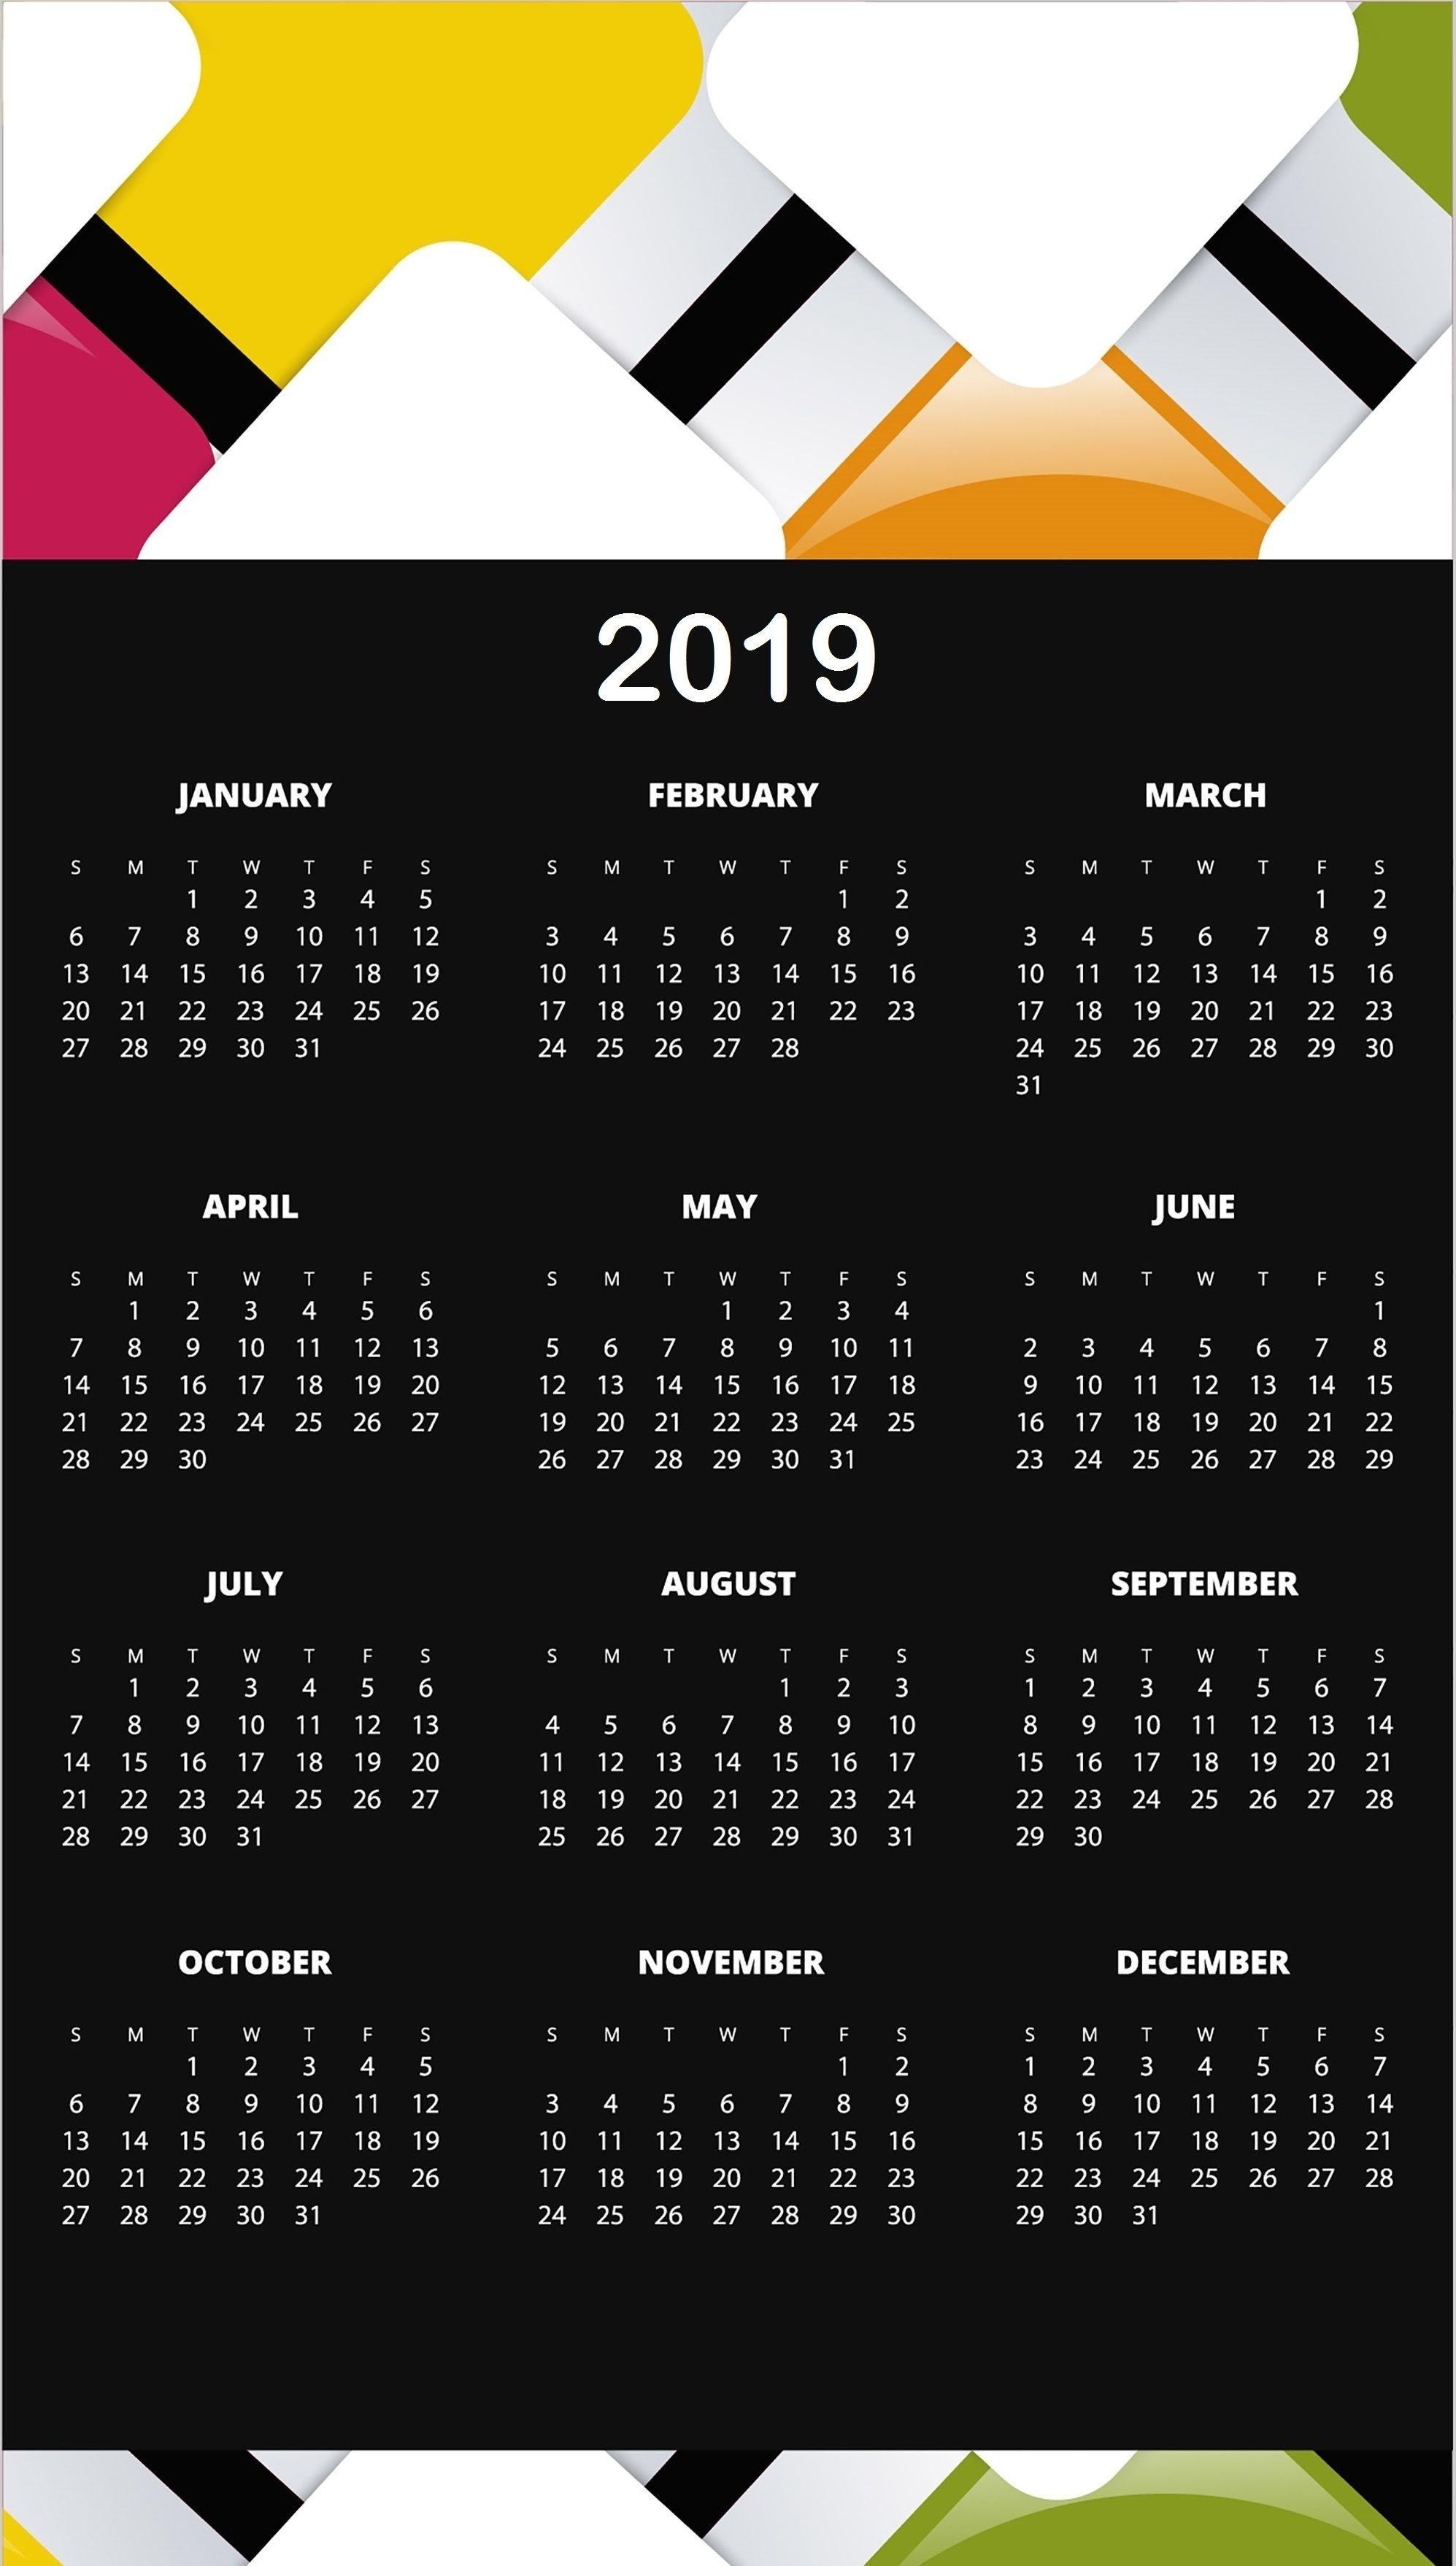 Printable Calendar April 2019 National Food Day | Calendar-National Monthly Calendar For Food